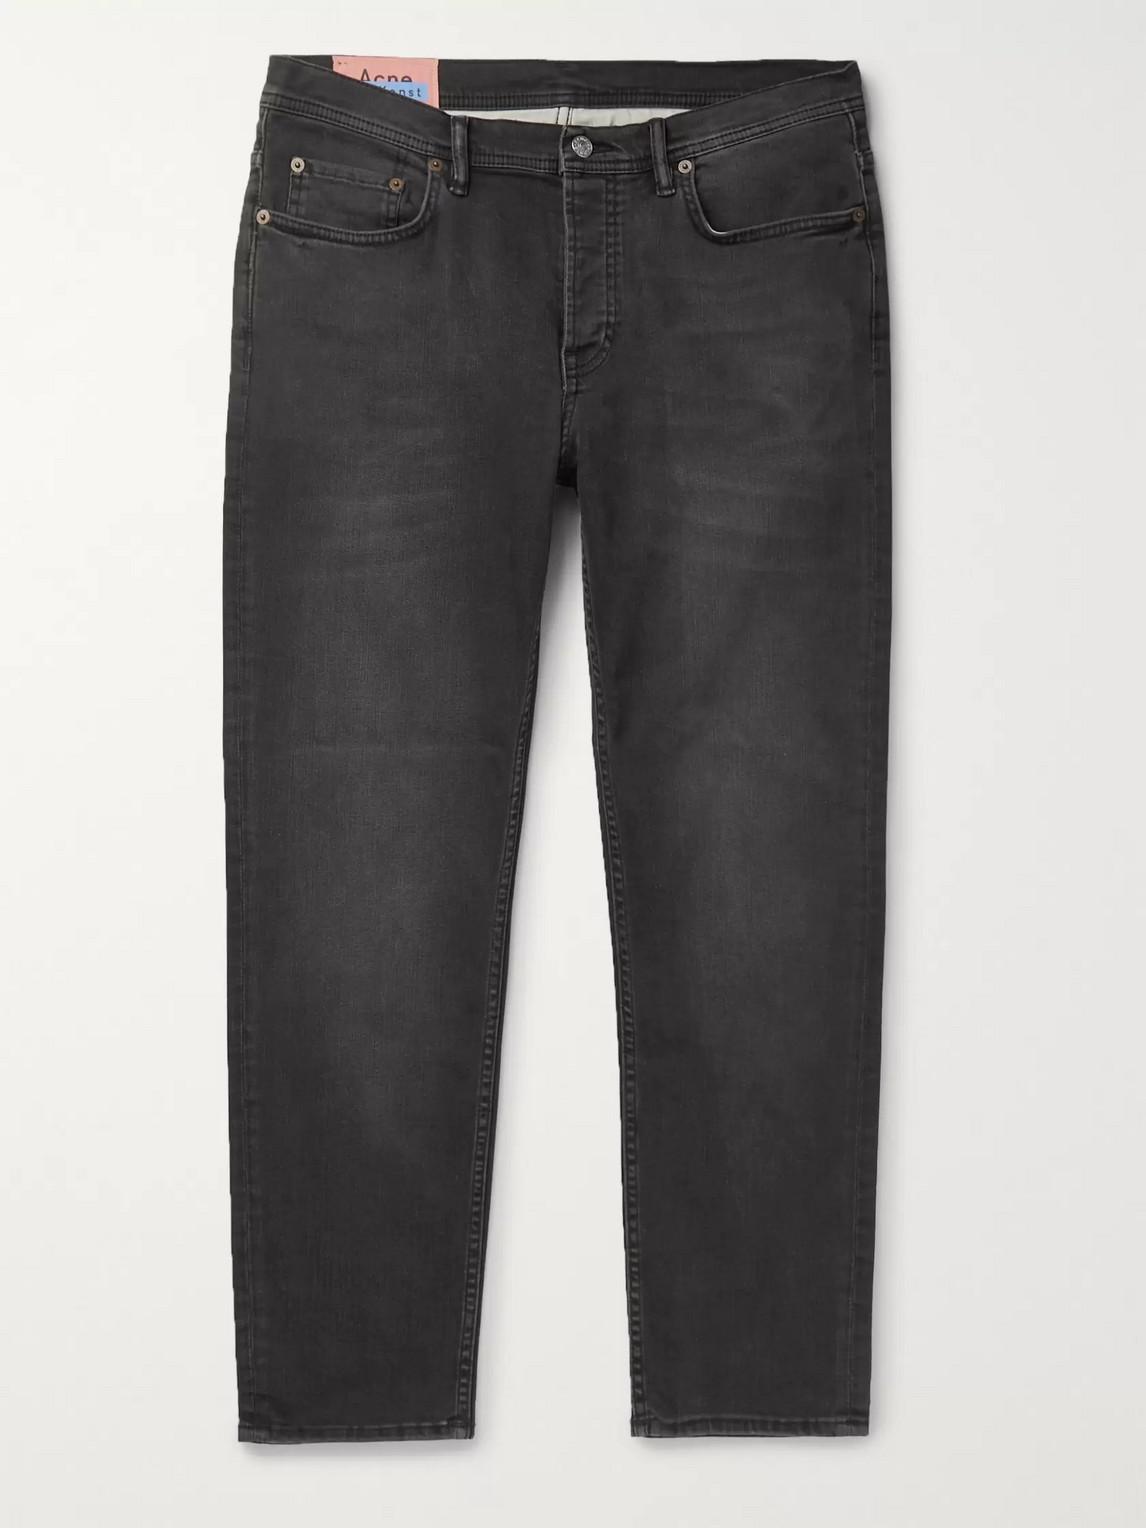 acne studios - river stretch-denim jeans - men - black